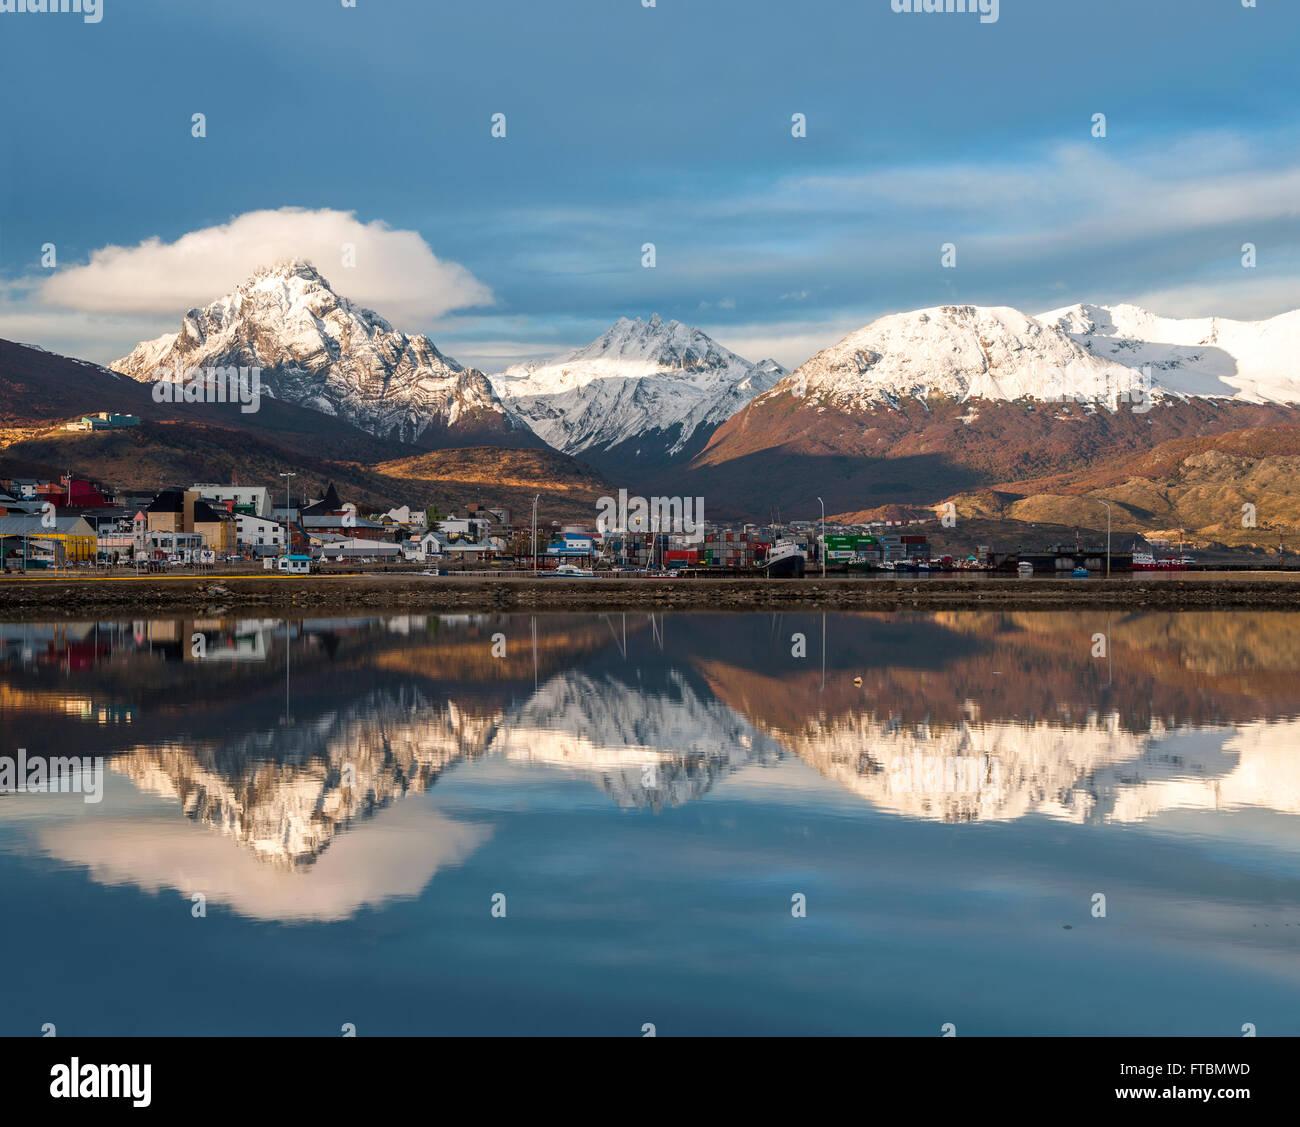 Port of Ushuaia, Tierra del Fuego, Patagonia, Argentina - Stock Image